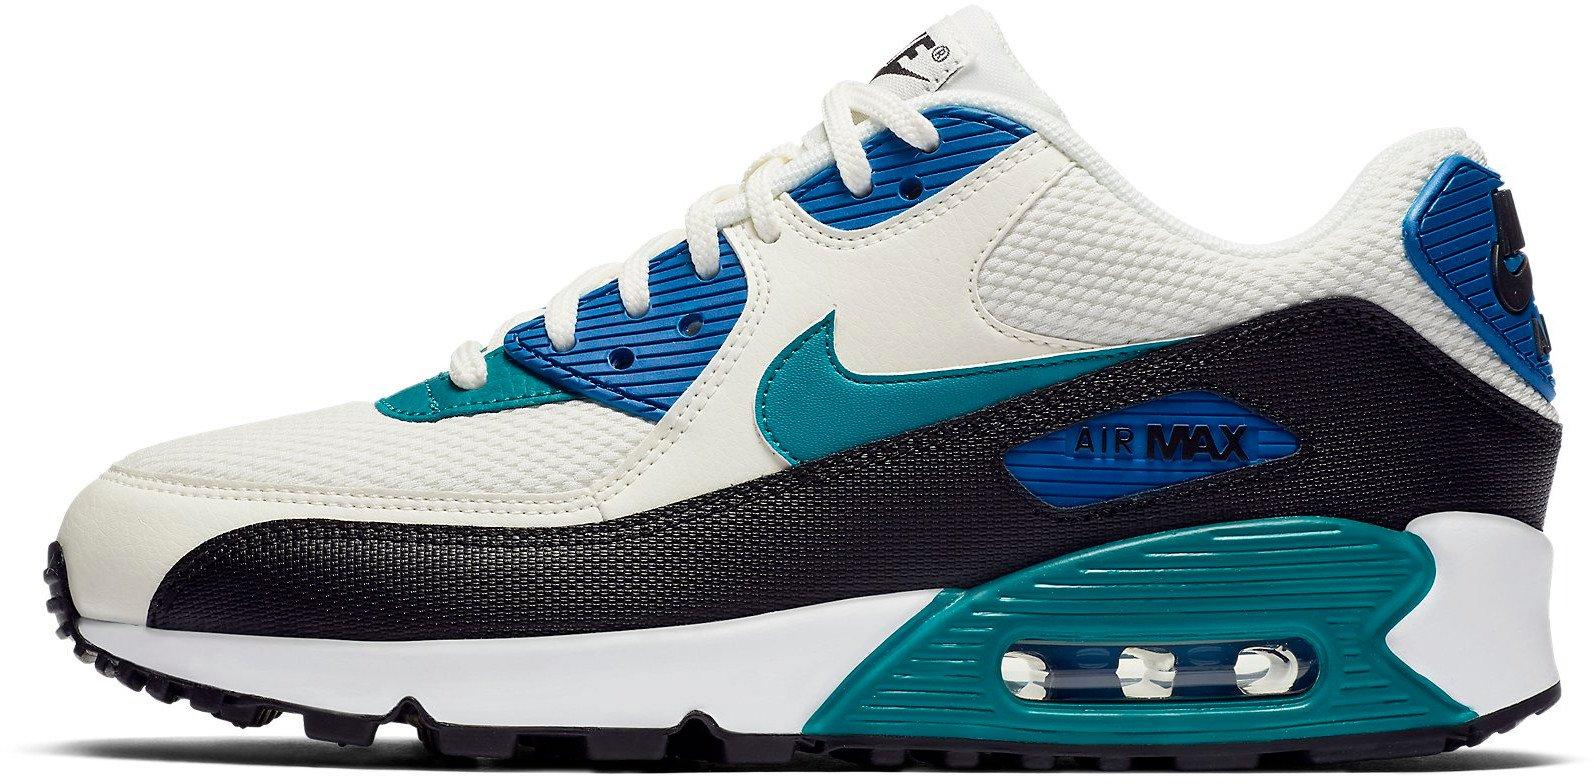 Obuv Nike WMNS AIR MAX 90 325213-134 Veľkosť 36,5 EU | 3,5 UK | 6 US | 23 CM